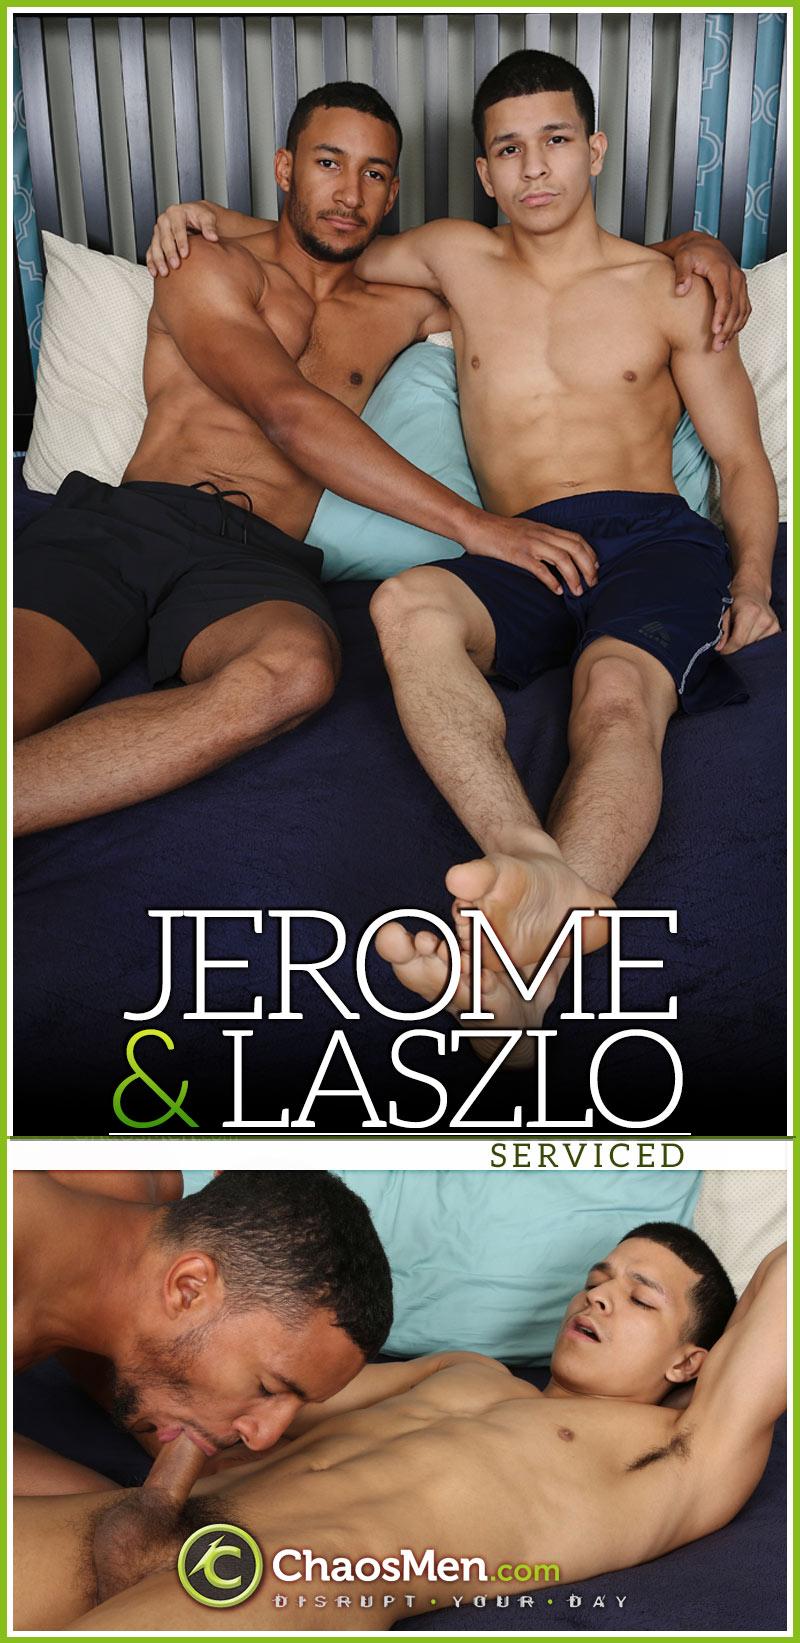 Jerome Services Laszlo at ChaosMen